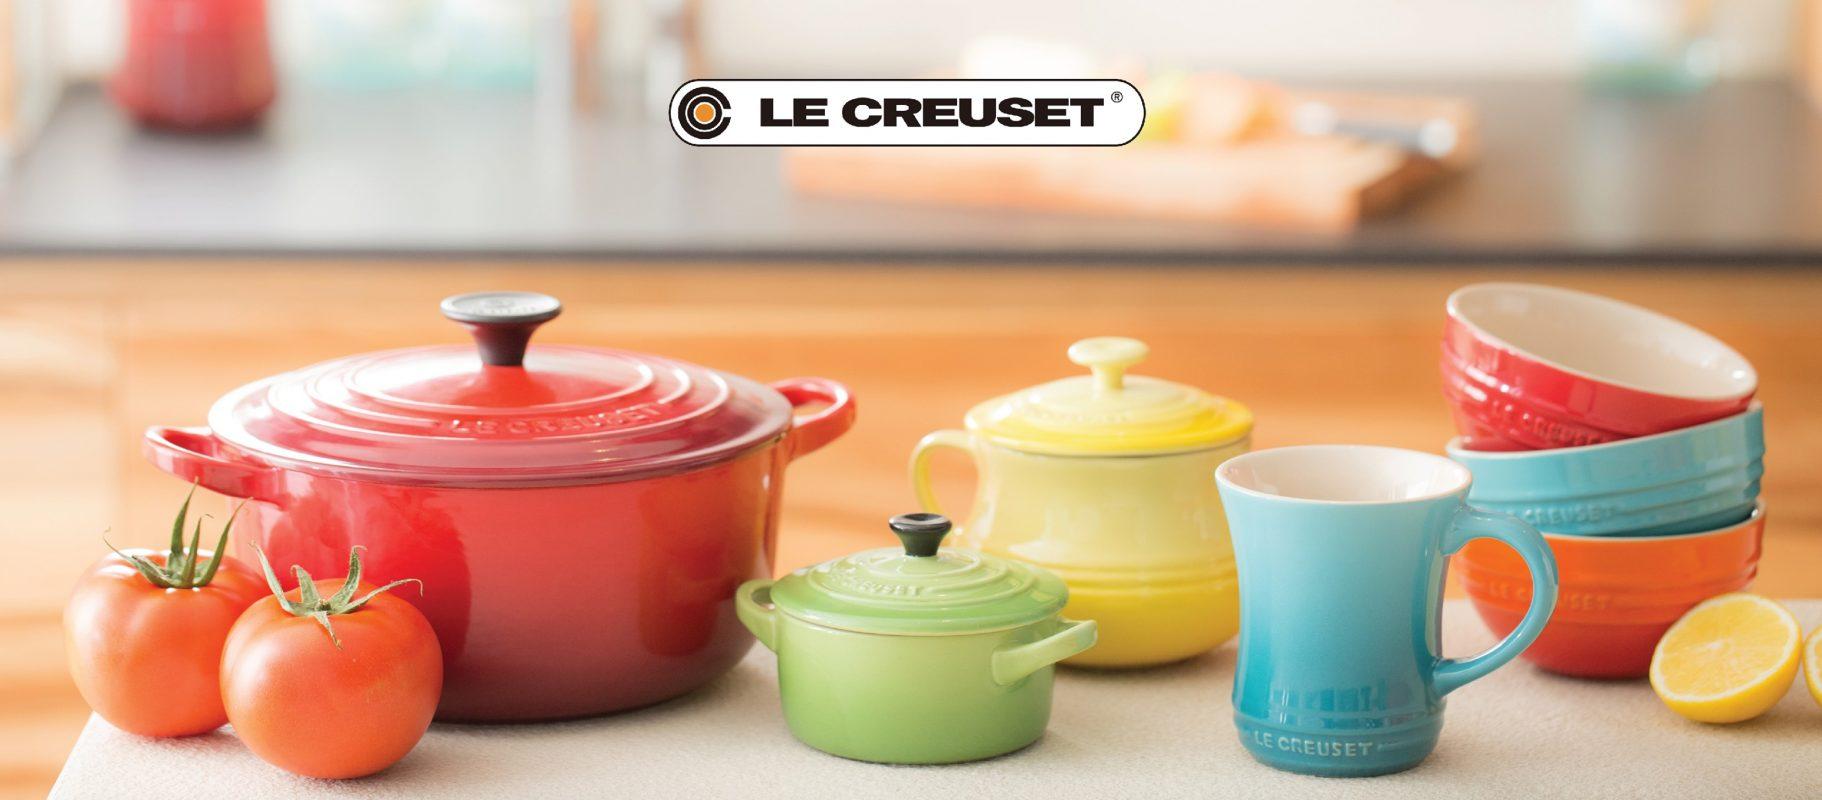 【Selfridges 網購】Le Creuset 8折  熱門顏色趁機入手 (已完結)